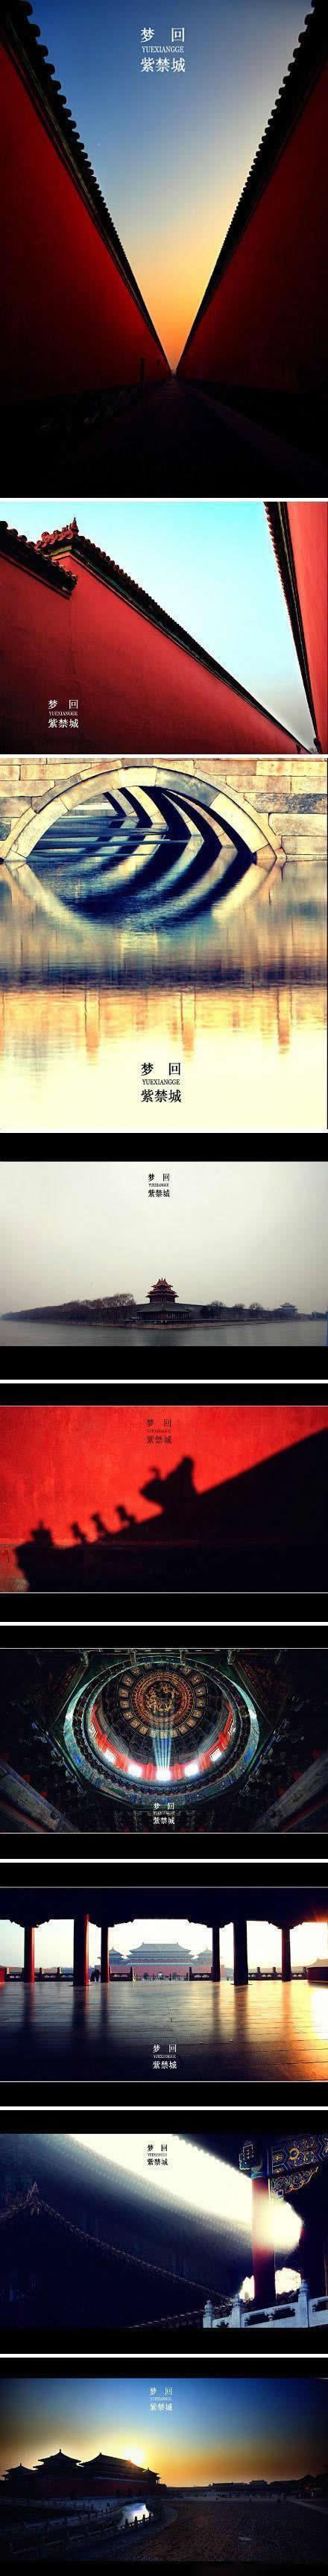 Forbidden City, Beijing, China 紫禁城